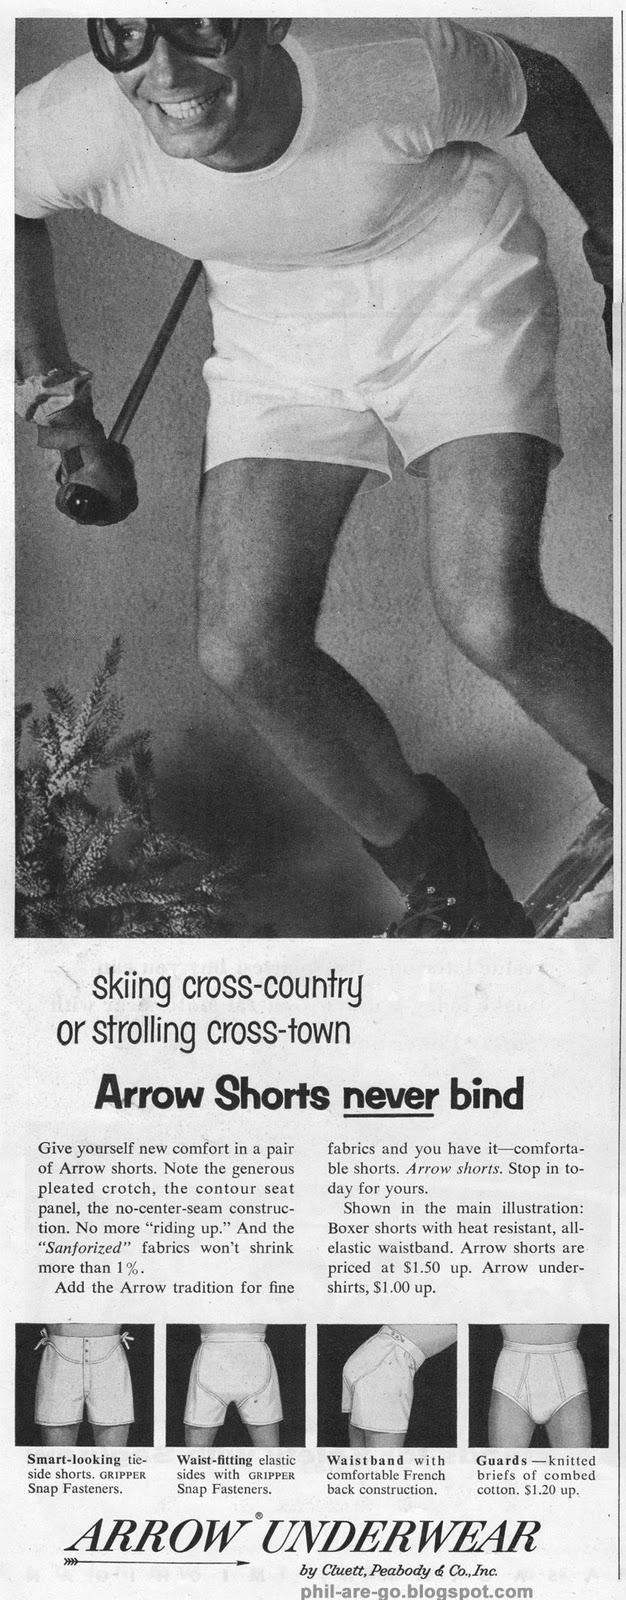 Phil Are Go!: Arrow Underwear - Riding high